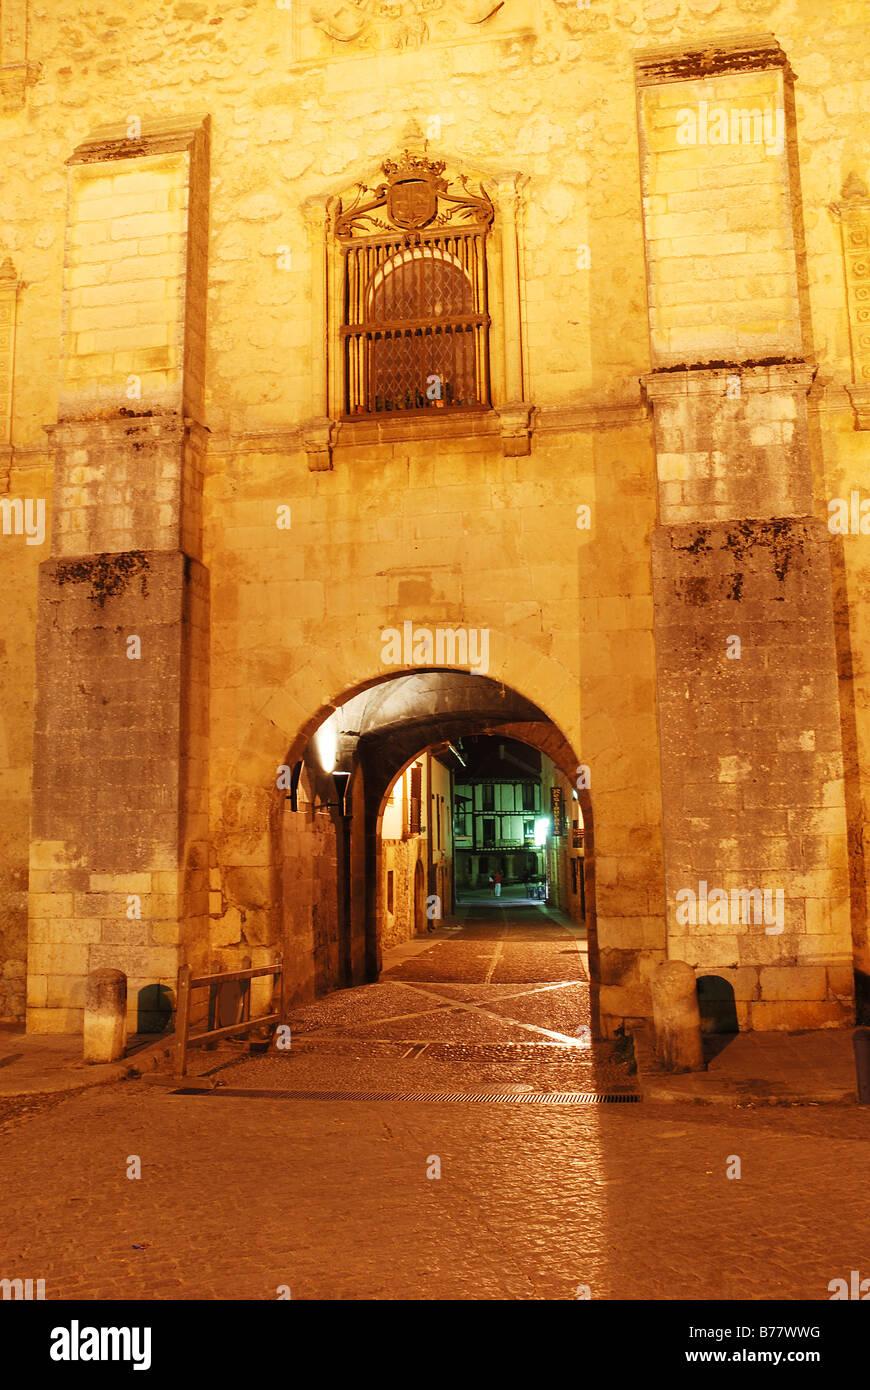 Arco del Archivo. Night view. Covarrubias. Burgos province. Castile Leon. Spain. - Stock Image